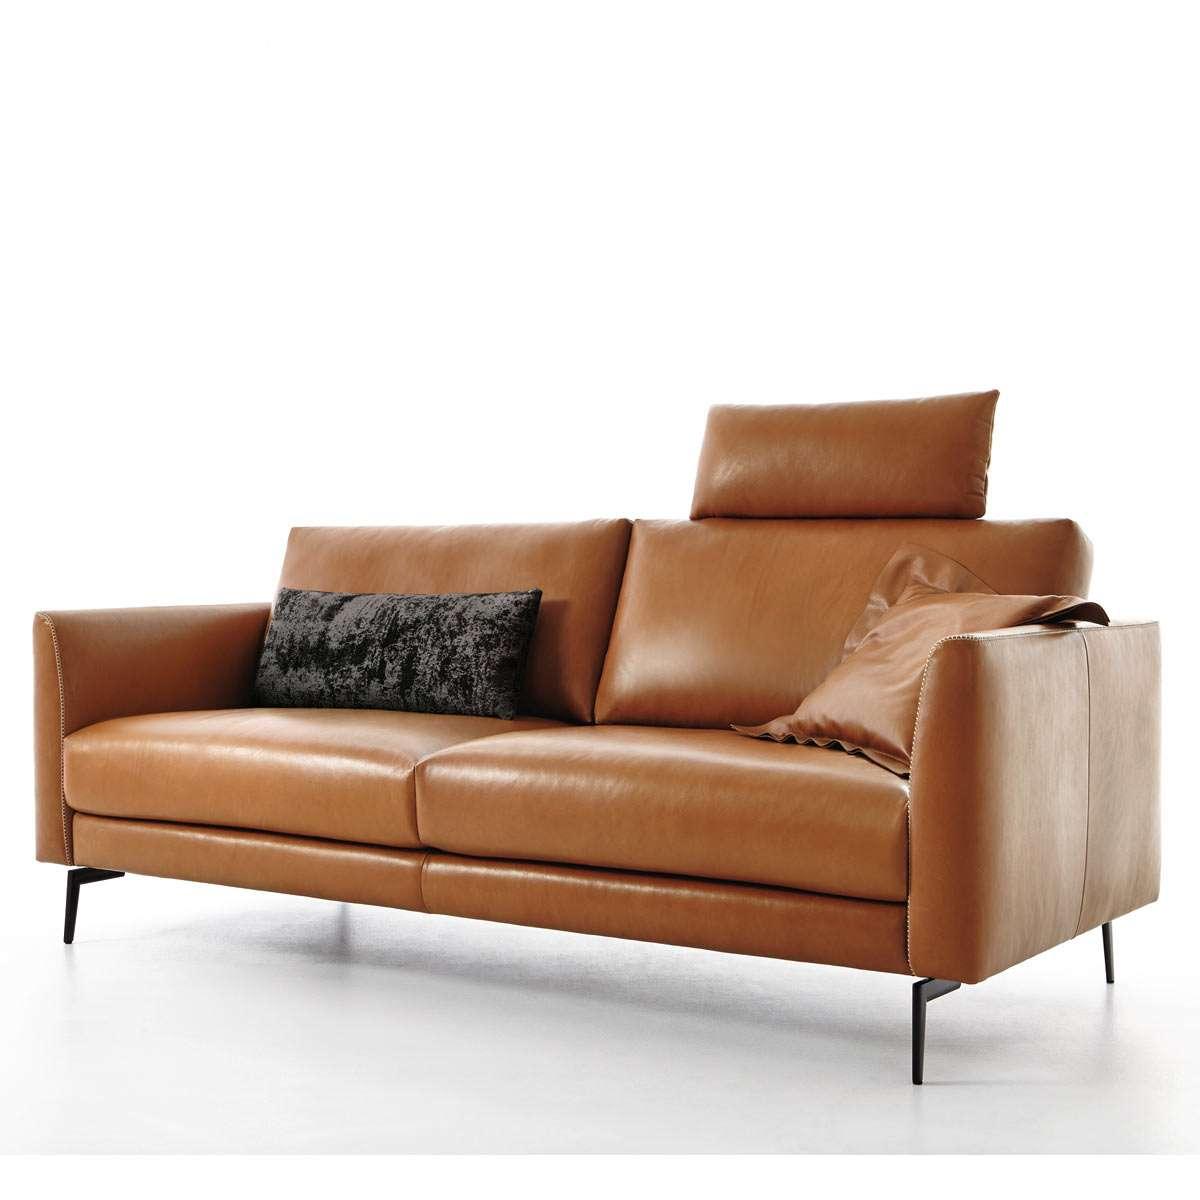 Full Size of Koinor Couch Francis Sofa Lederfarben Gebraucht Outlet Omega Flamme Minotti Xxl U Form W Schillig Landhaus Stoff Grau Dreisitzer Günstig Ecksofa Garten Sofa Koinor Sofa